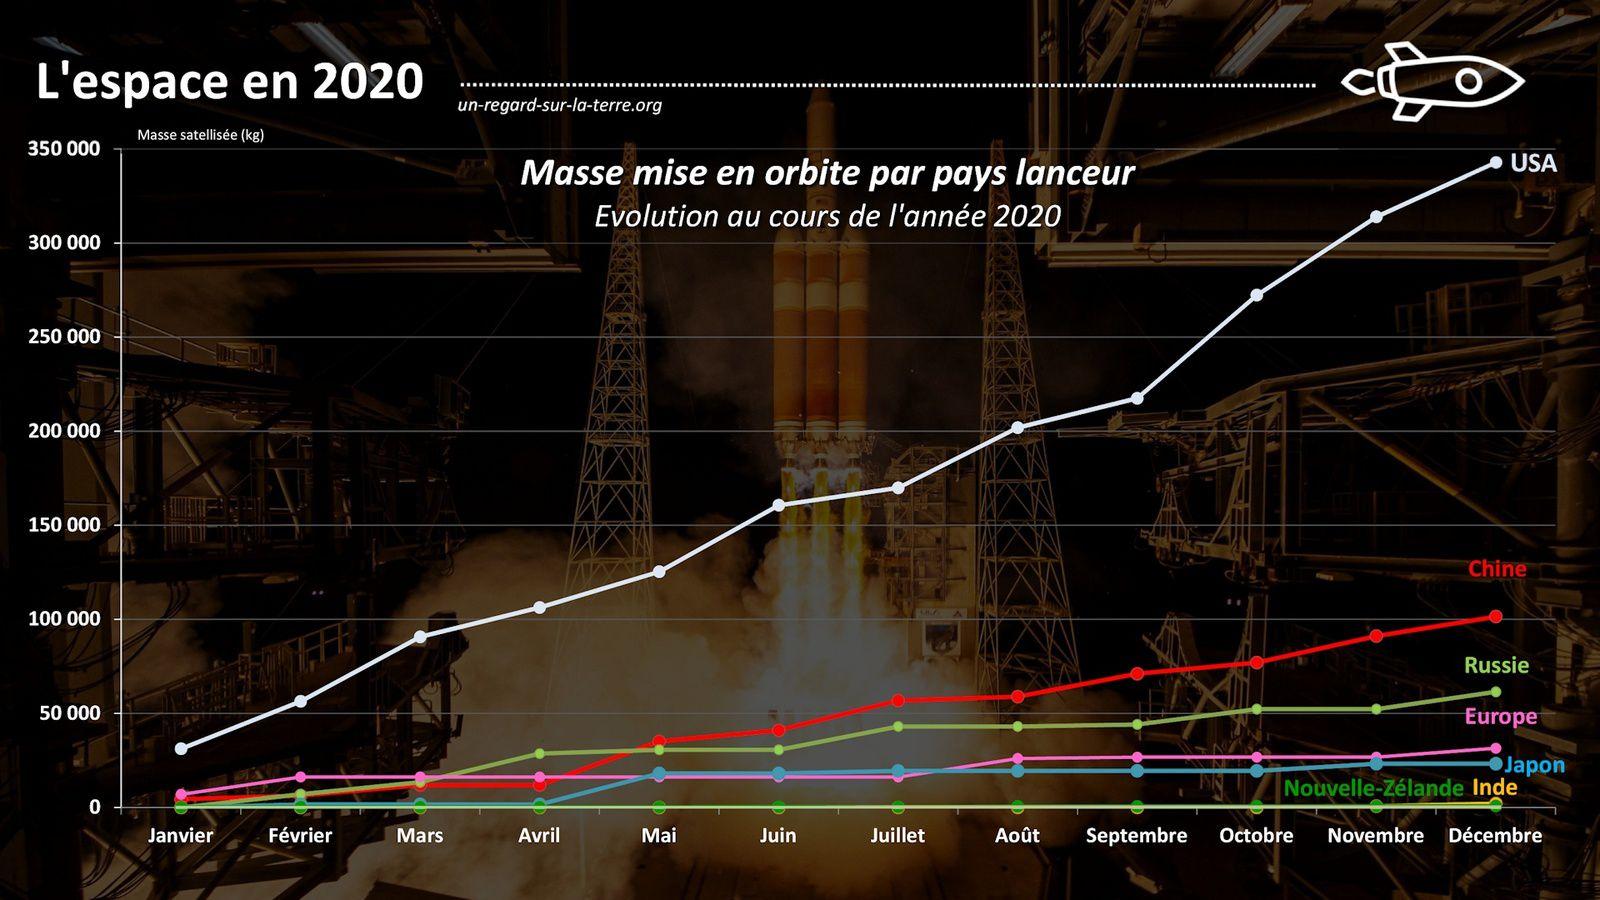 Année spatiale 2020 - Lancements orbitaux - Pays lanceurs - Masse satellisée par mois - Mass in orbit - space activities worldwide - bilan des lancements - 2020 in space by the numbers - Chine - USA - Russie - Europe - Inde - Japon - Israël - Iran - Nouvelle-Zélande - Satellites mass